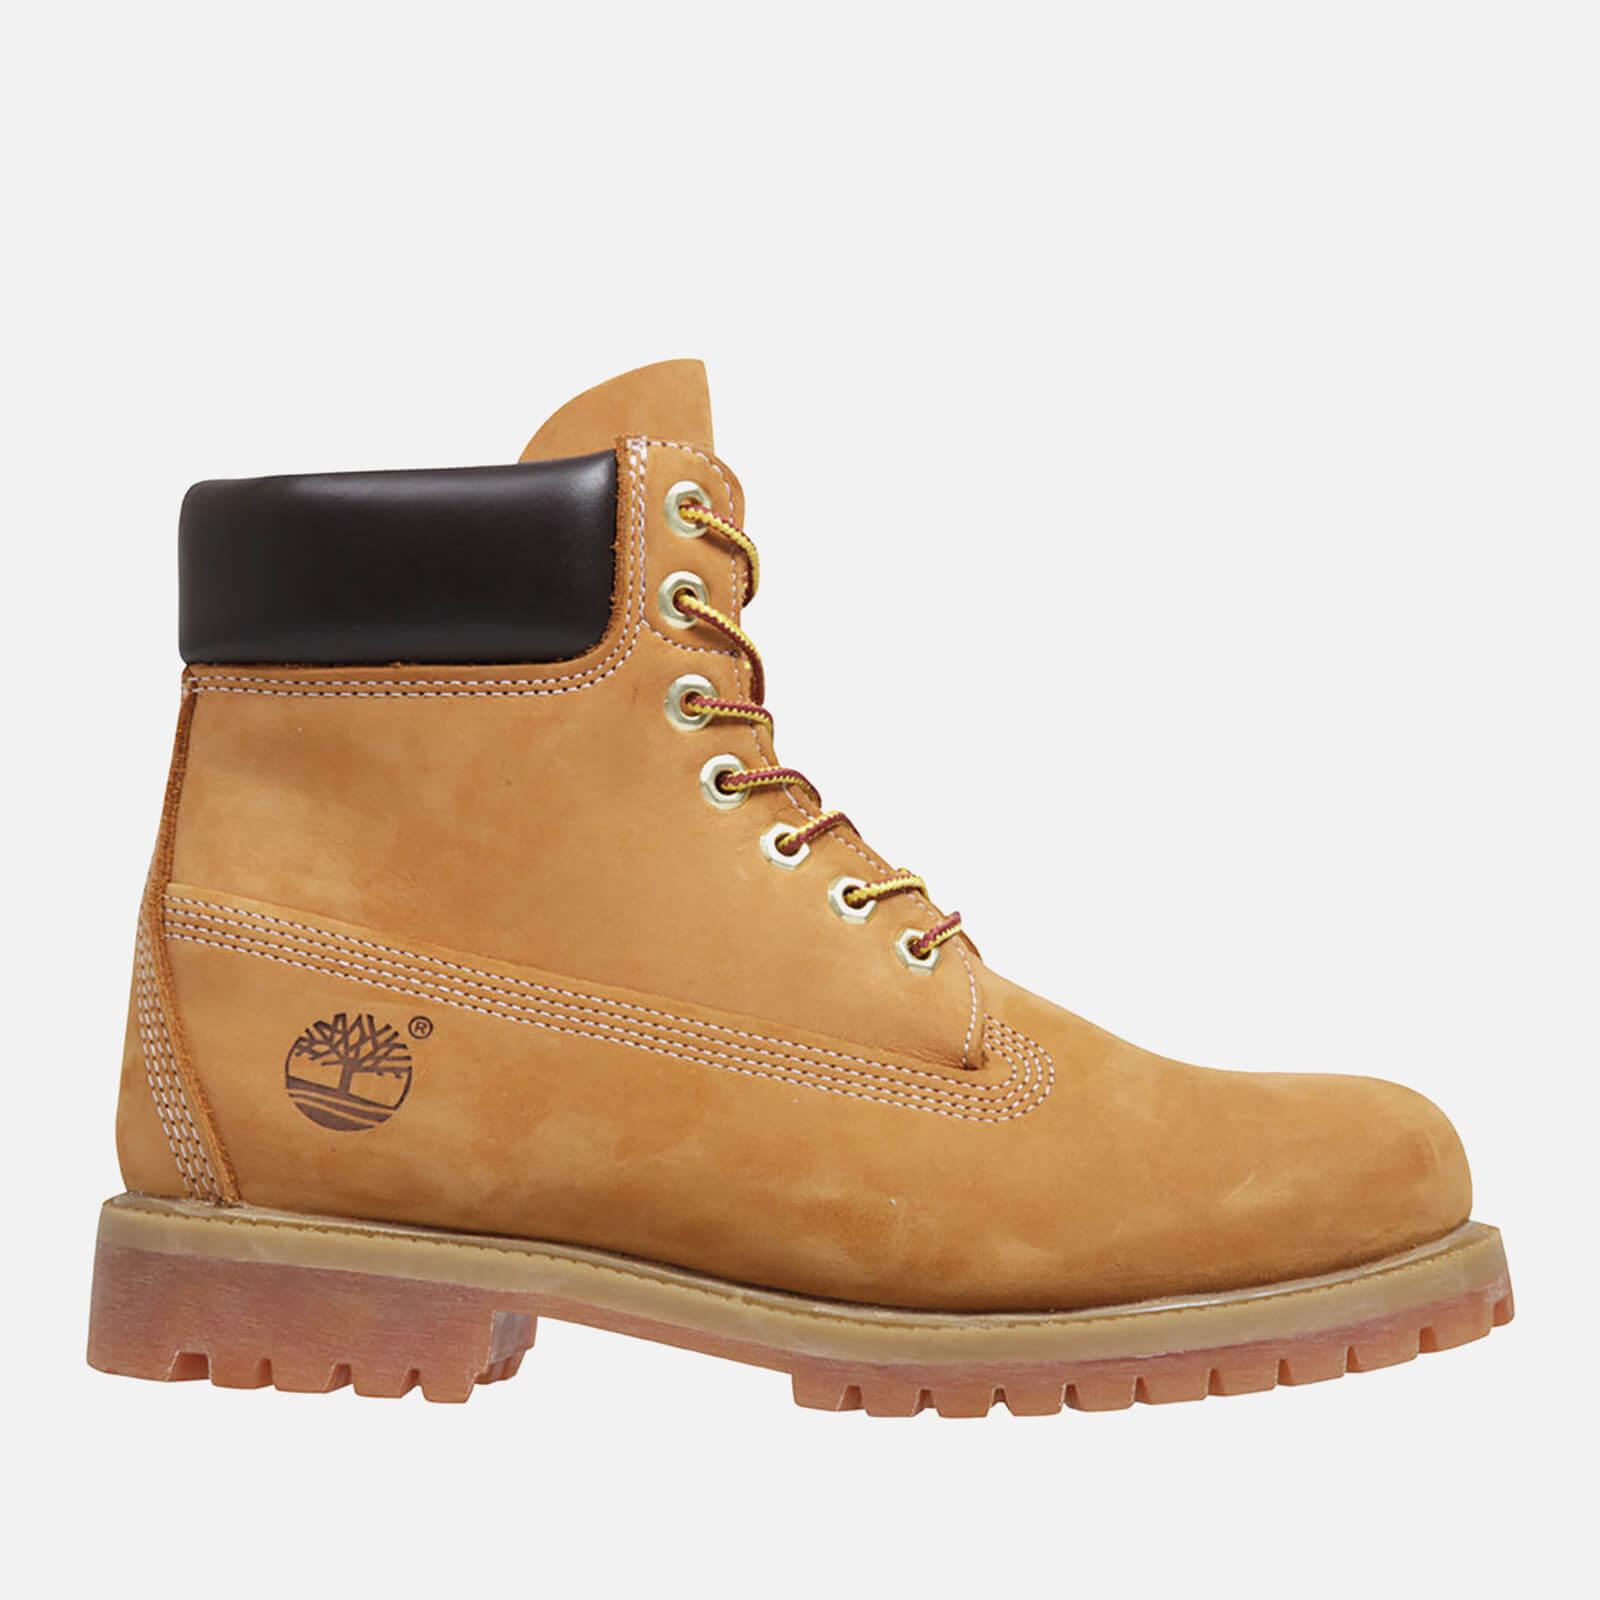 fca386de Timberland Men's 6 Inch Premium Boots - Wheat